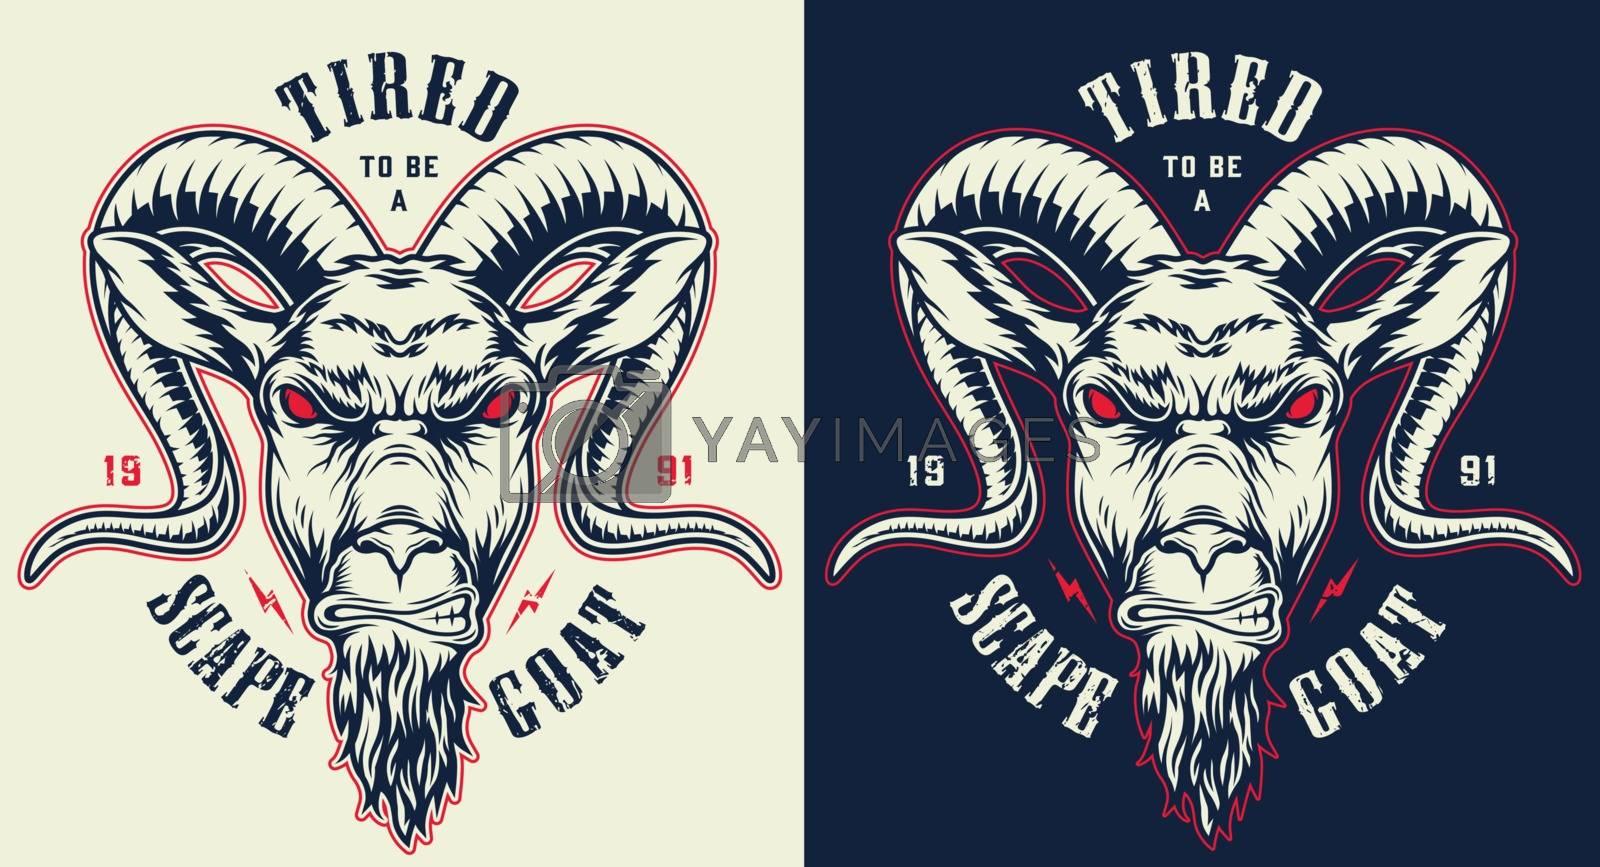 Emblems with goat. Concept prints designs. Vector illustraiton